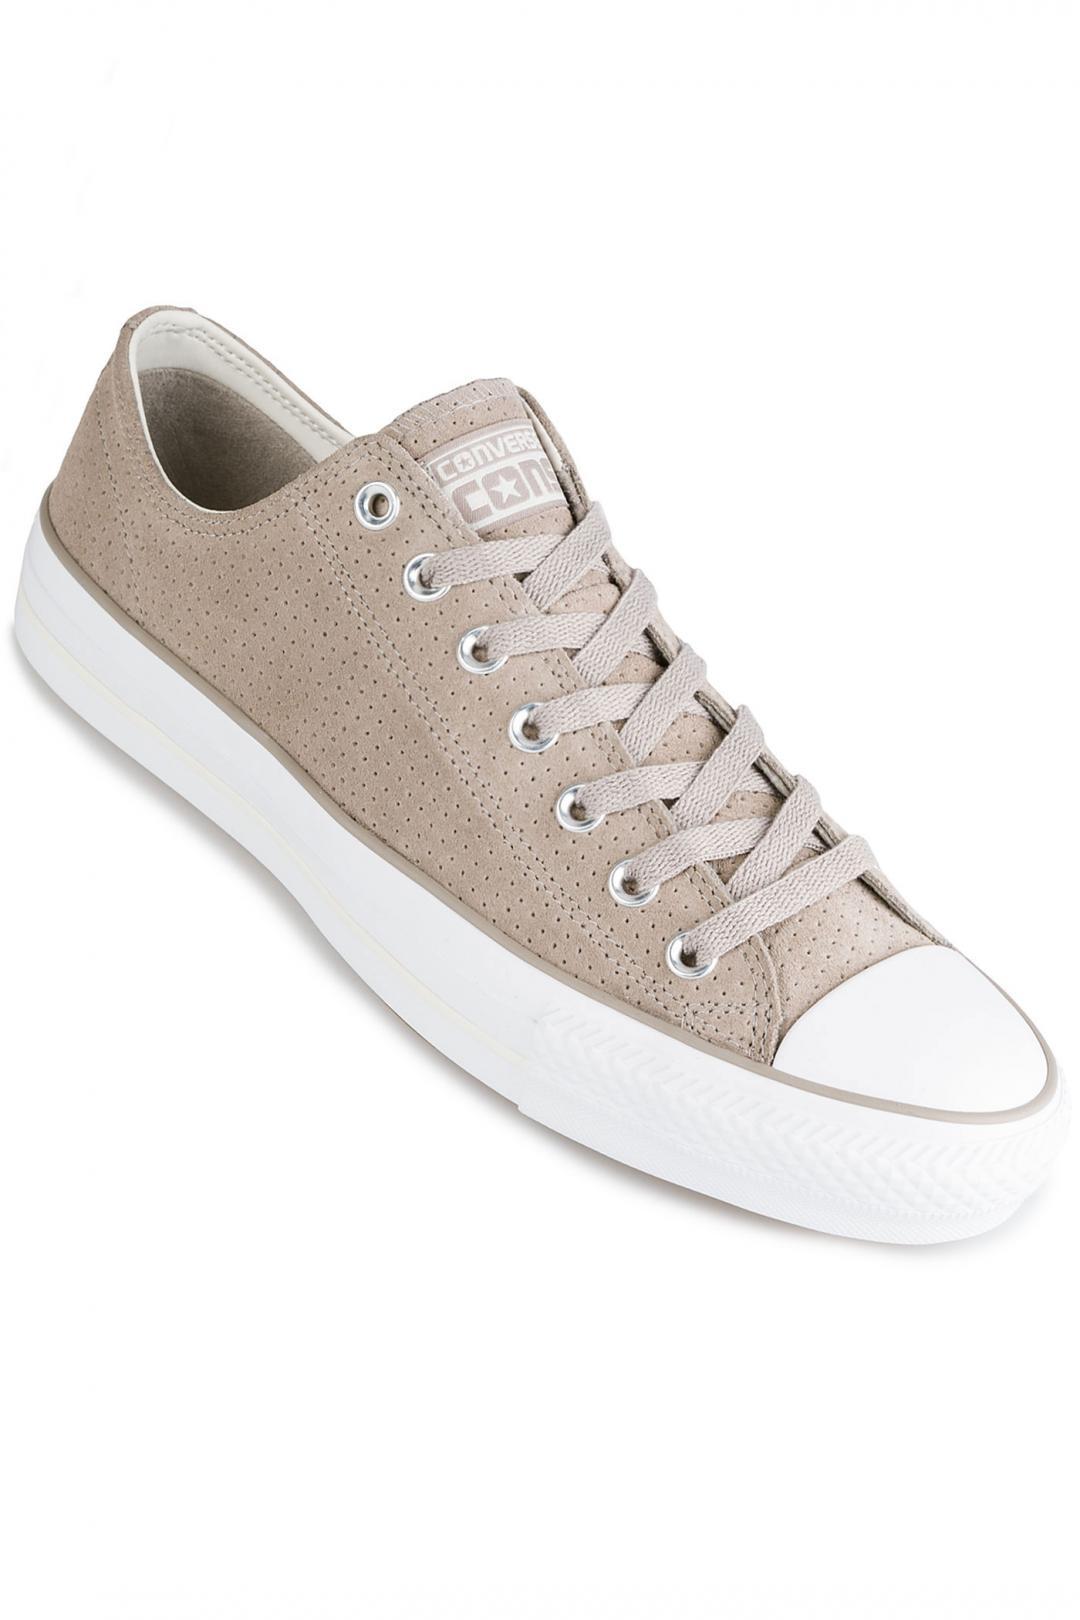 Uomo Converse CONS Chuck Taylor All Star Pro Ox malted egret white | Sneaker